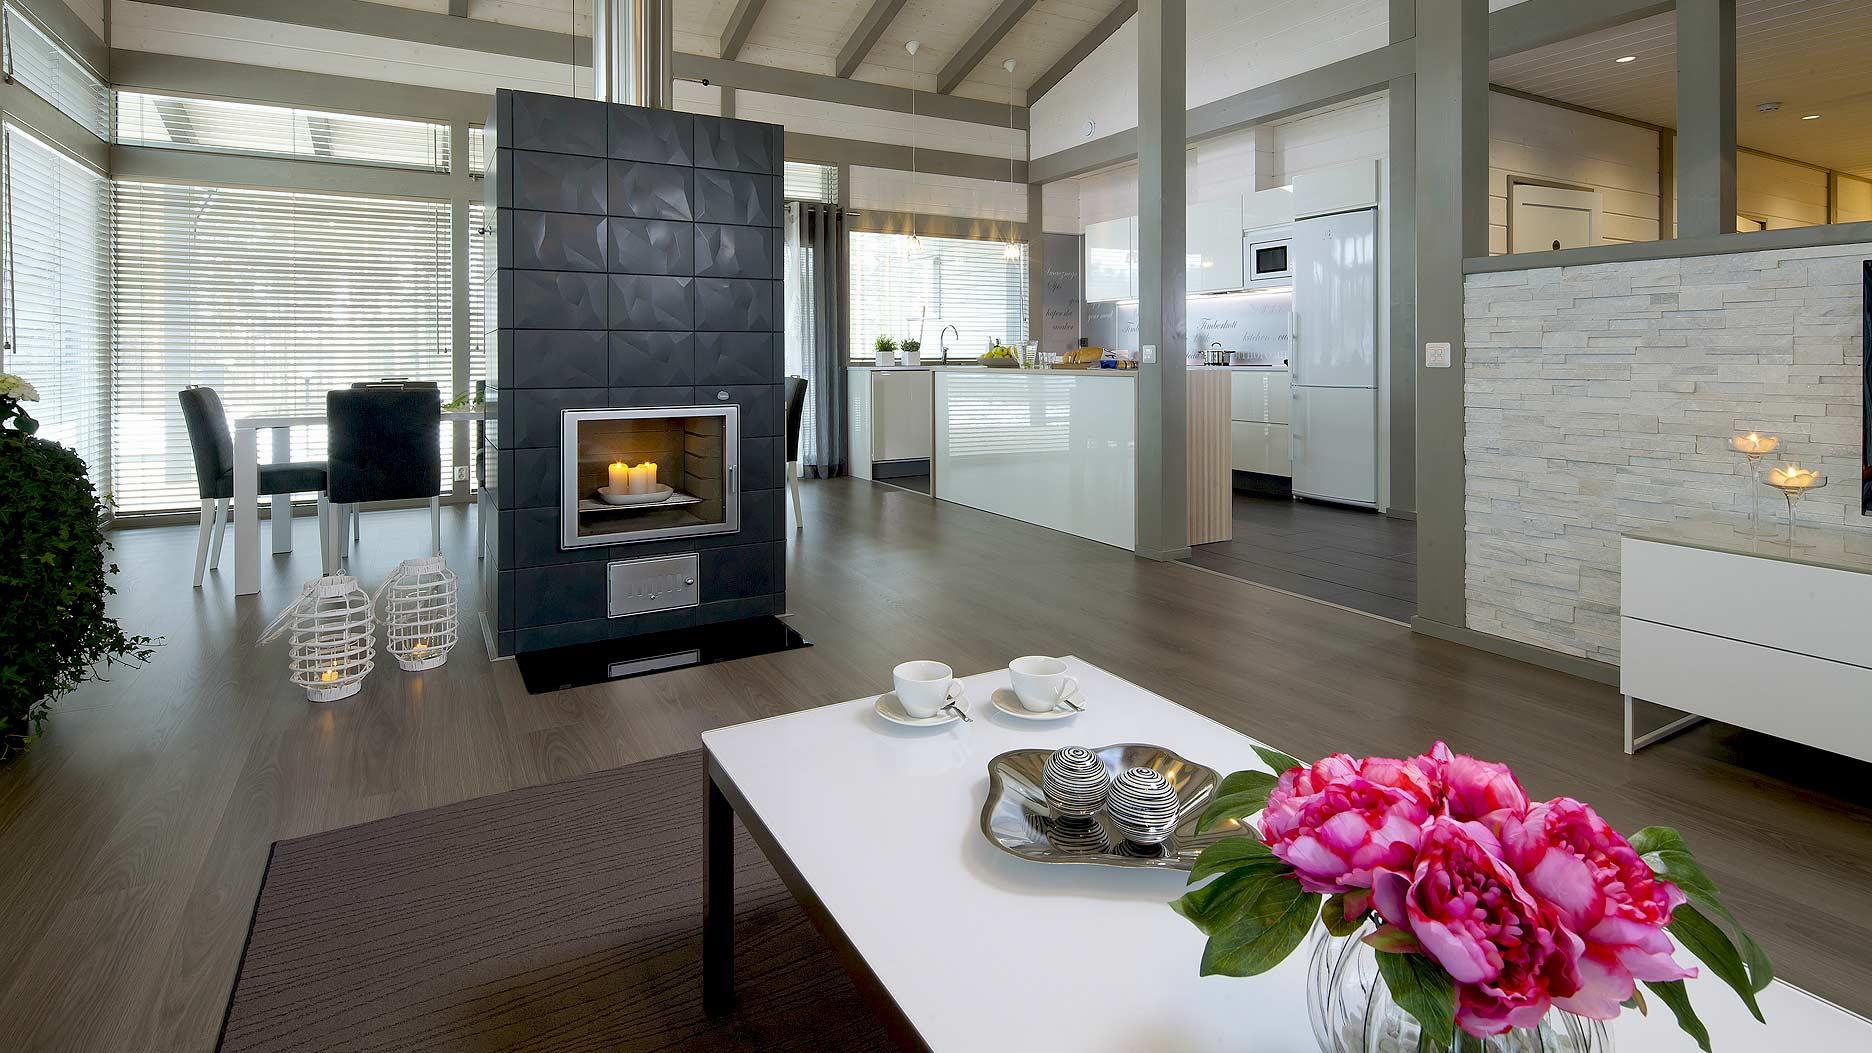 Moderne Woonkamer Met Open Keuken